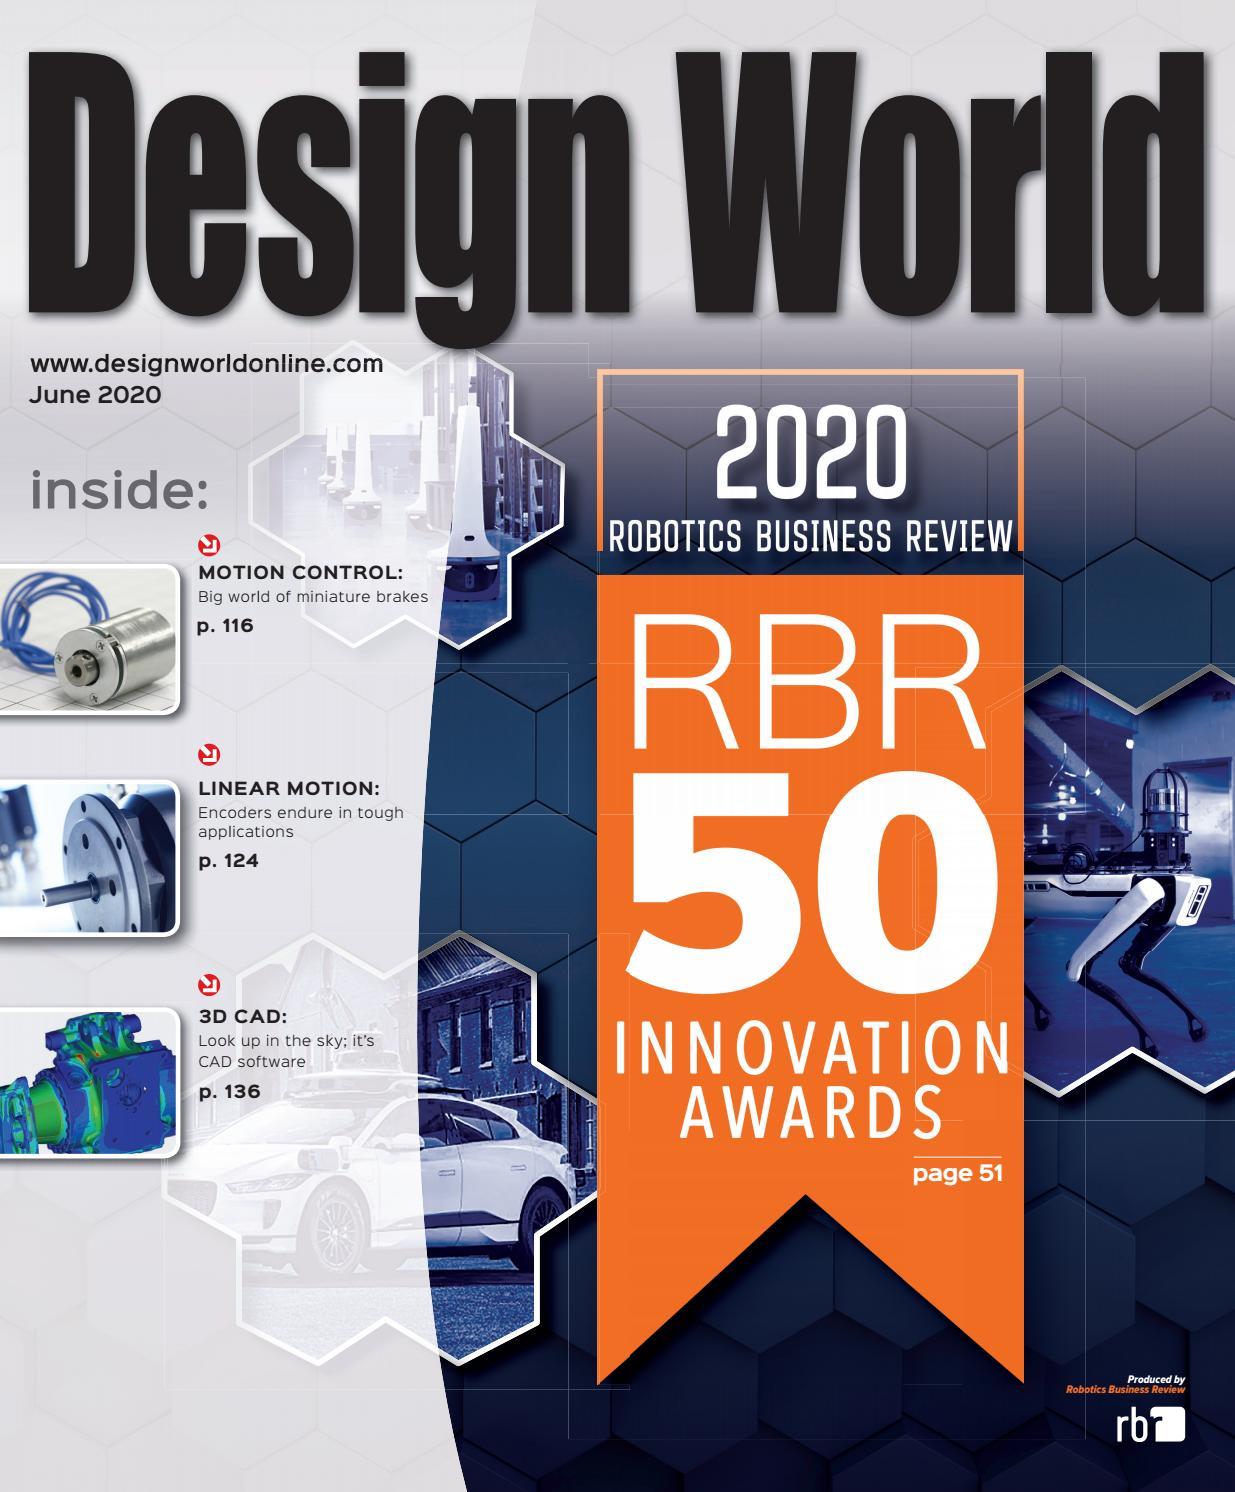 honda engine cover upgrade rbr kit